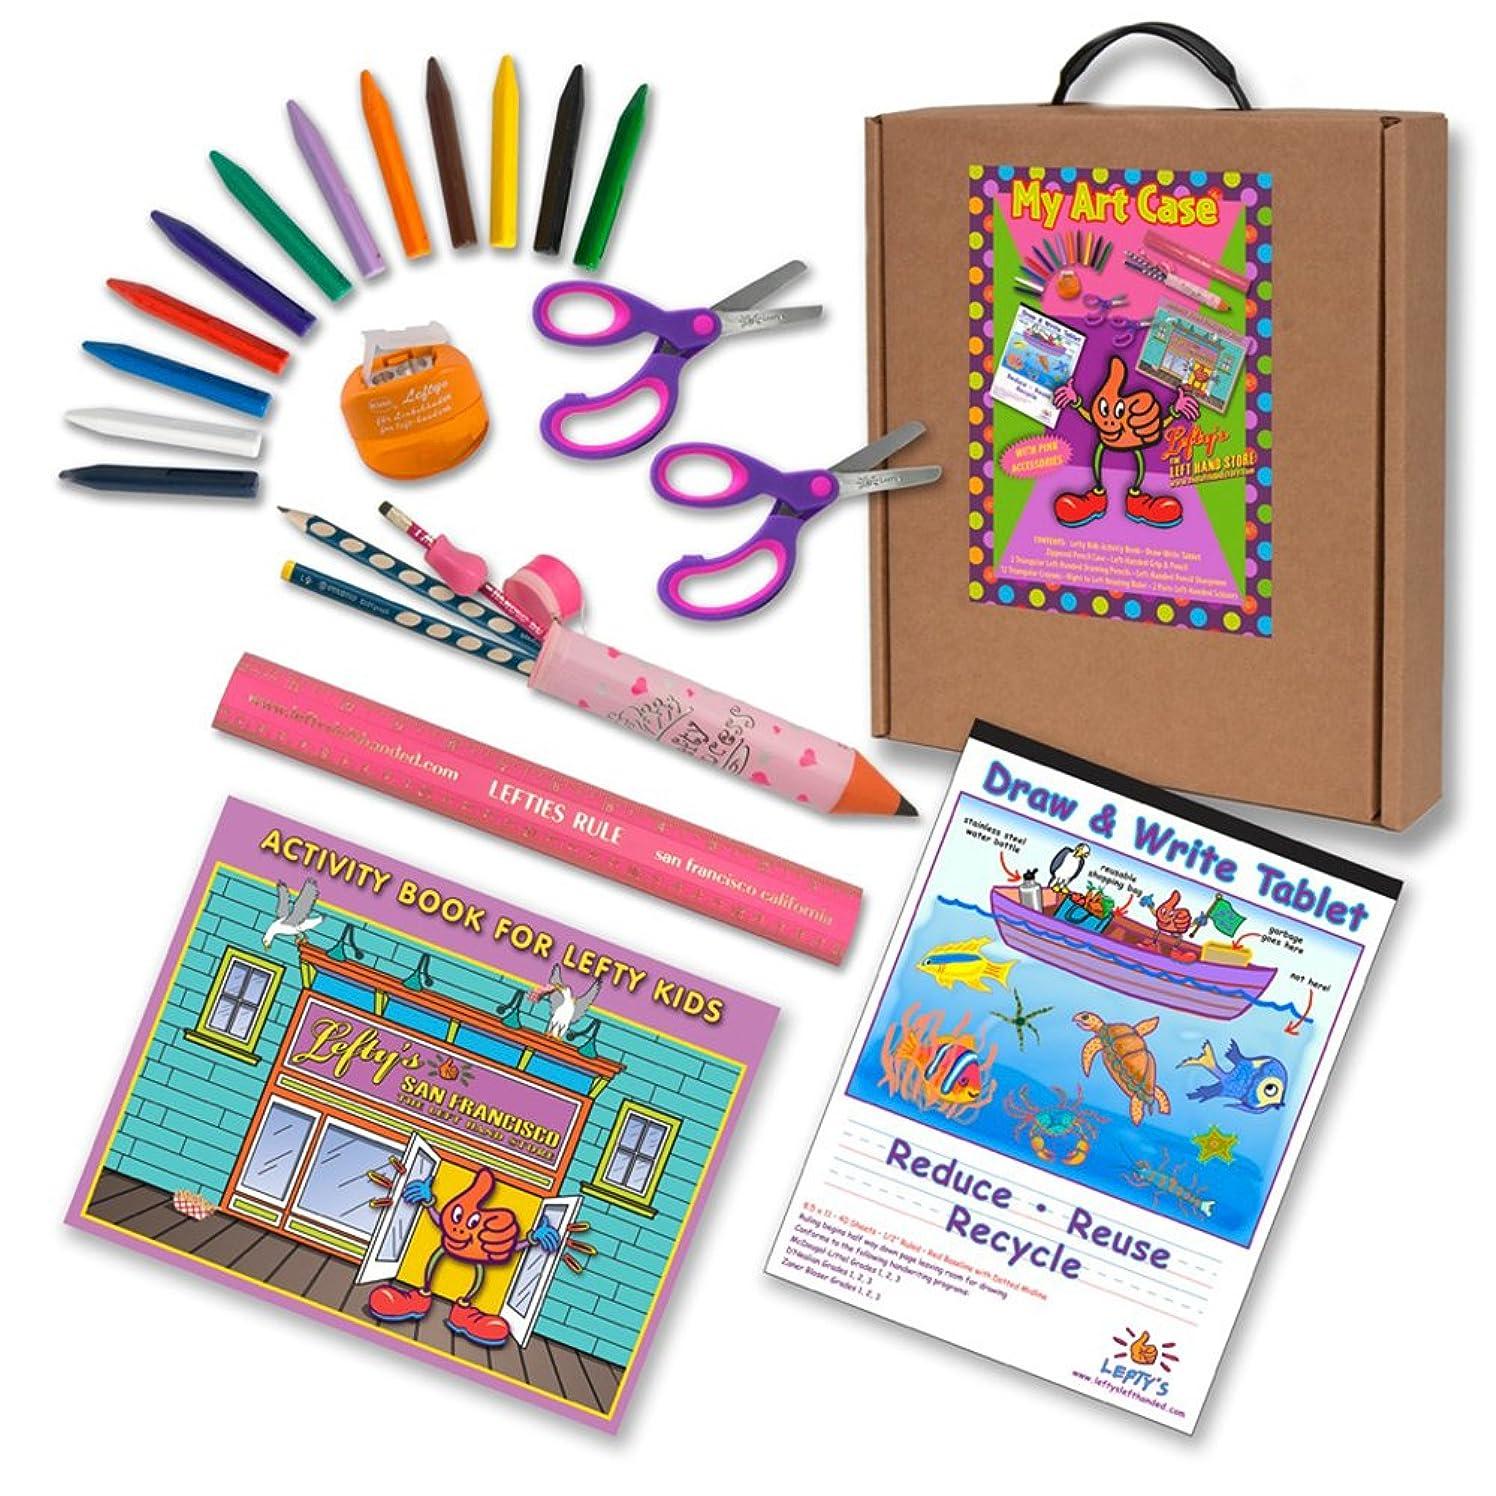 Left-handed Art and Activity Kit (Activity Book, Pencils, Scissors & More) Warm Pink & Purple Tones, 23 Pc Set